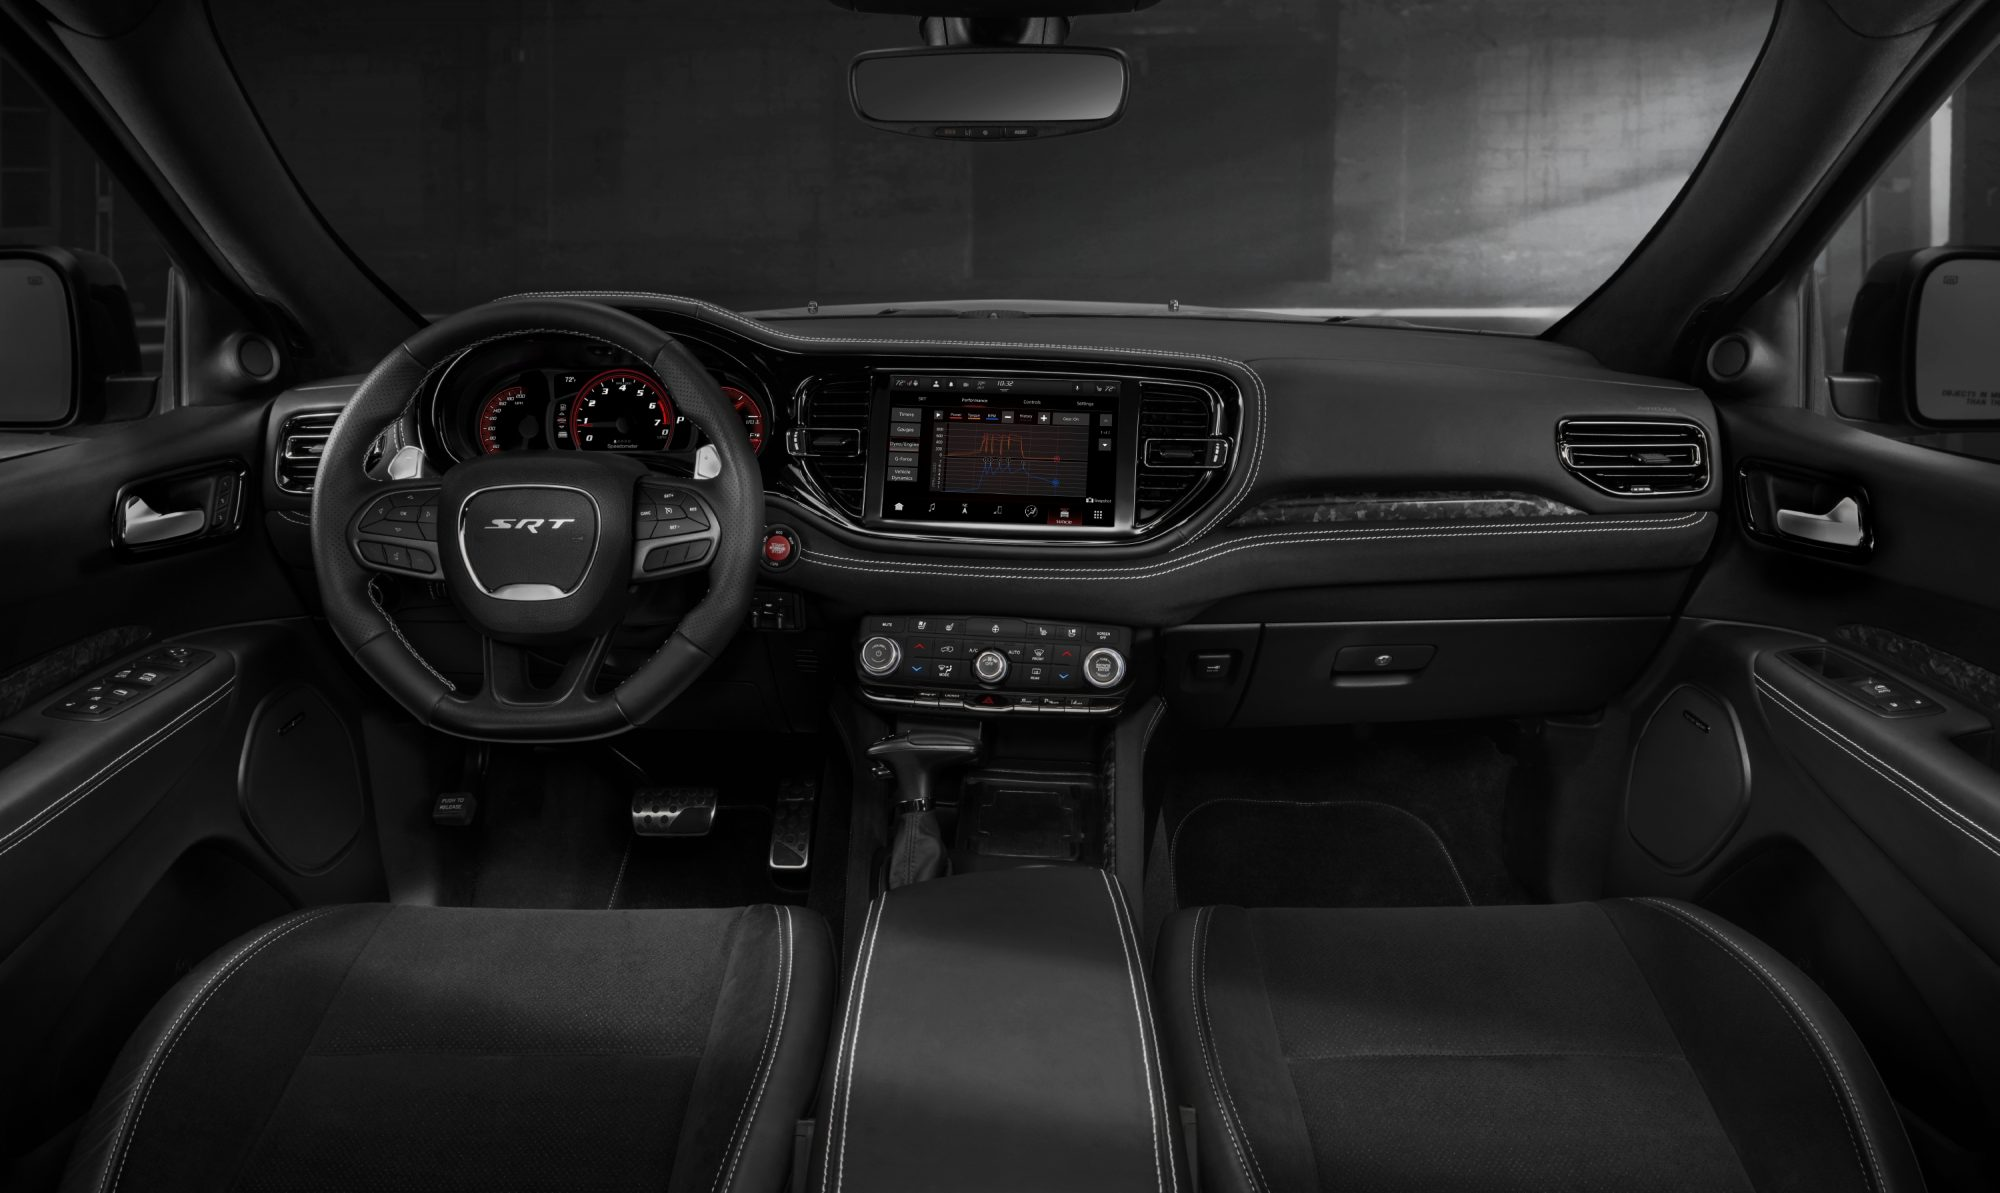 2021 Dodge Durango SRT Hellcat interior